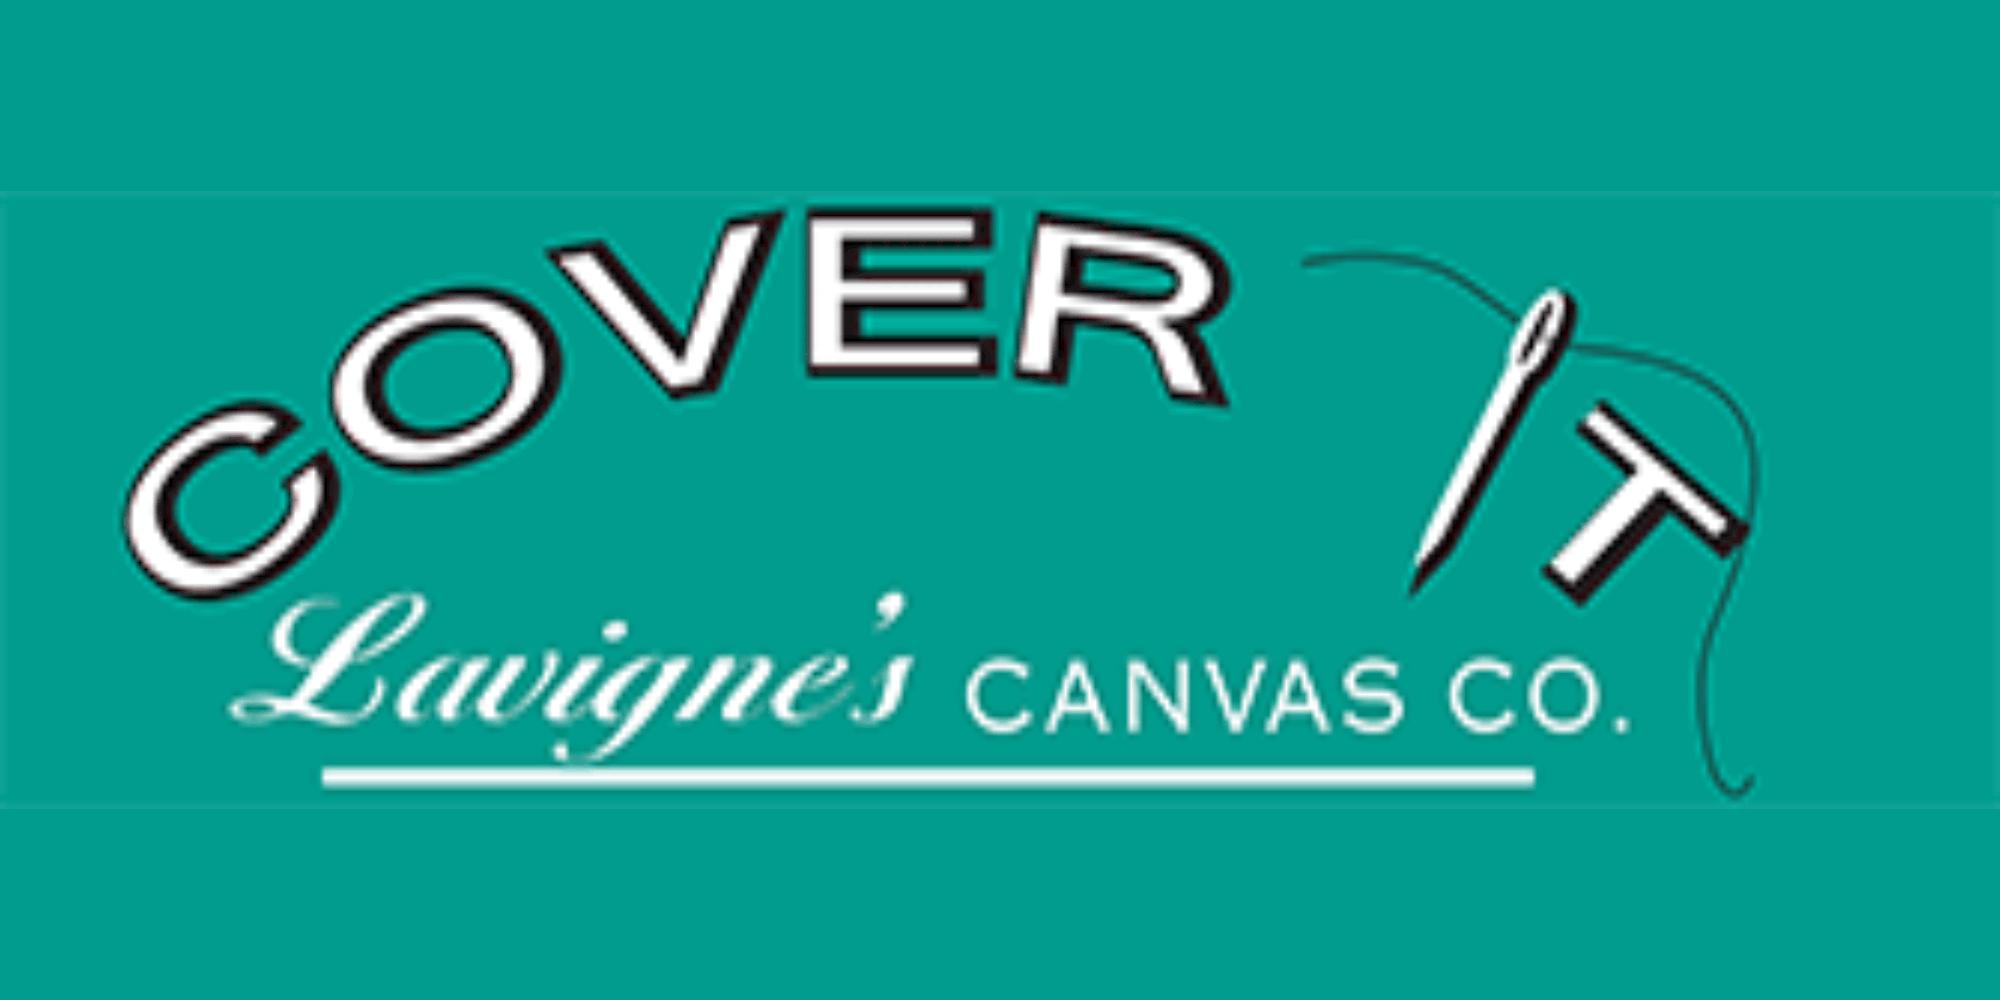 lavignes canvas Logo Design, website design, search engine marketing, search engine optimization